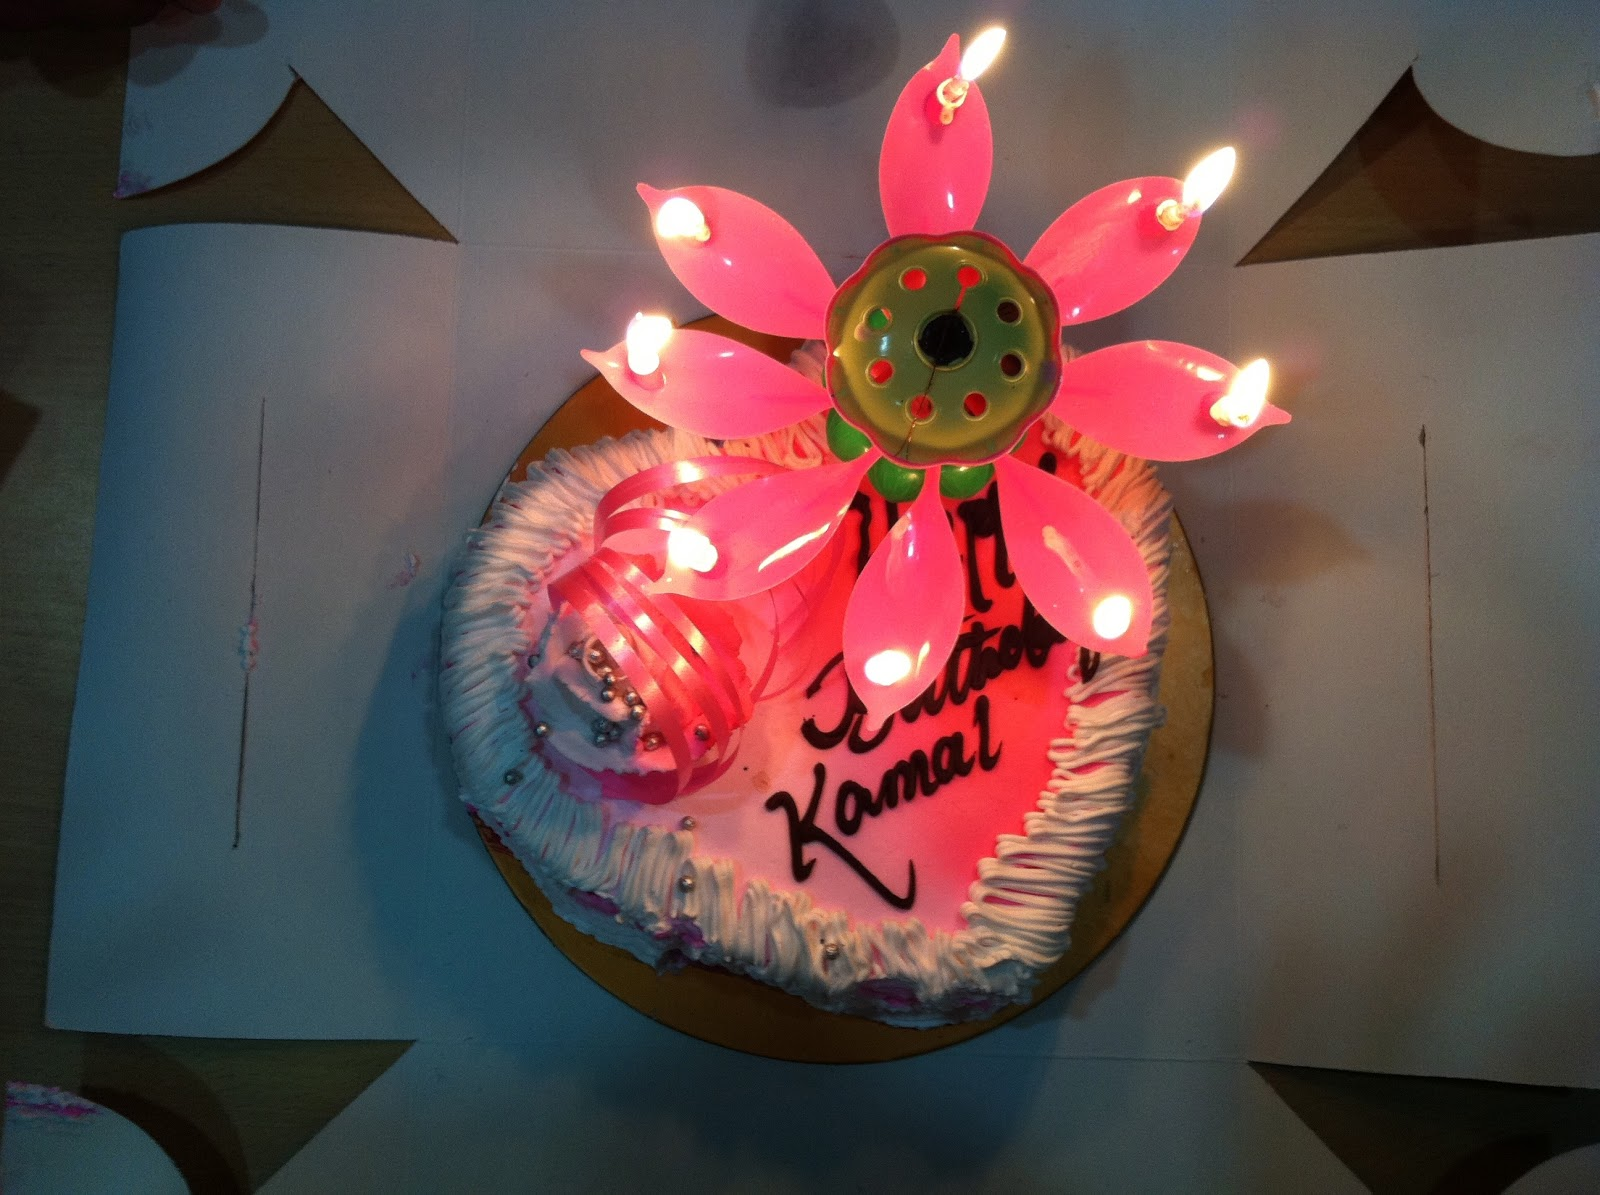 Cake Images With Name Kamal : Pin Kamal Hassan Cake on Pinterest